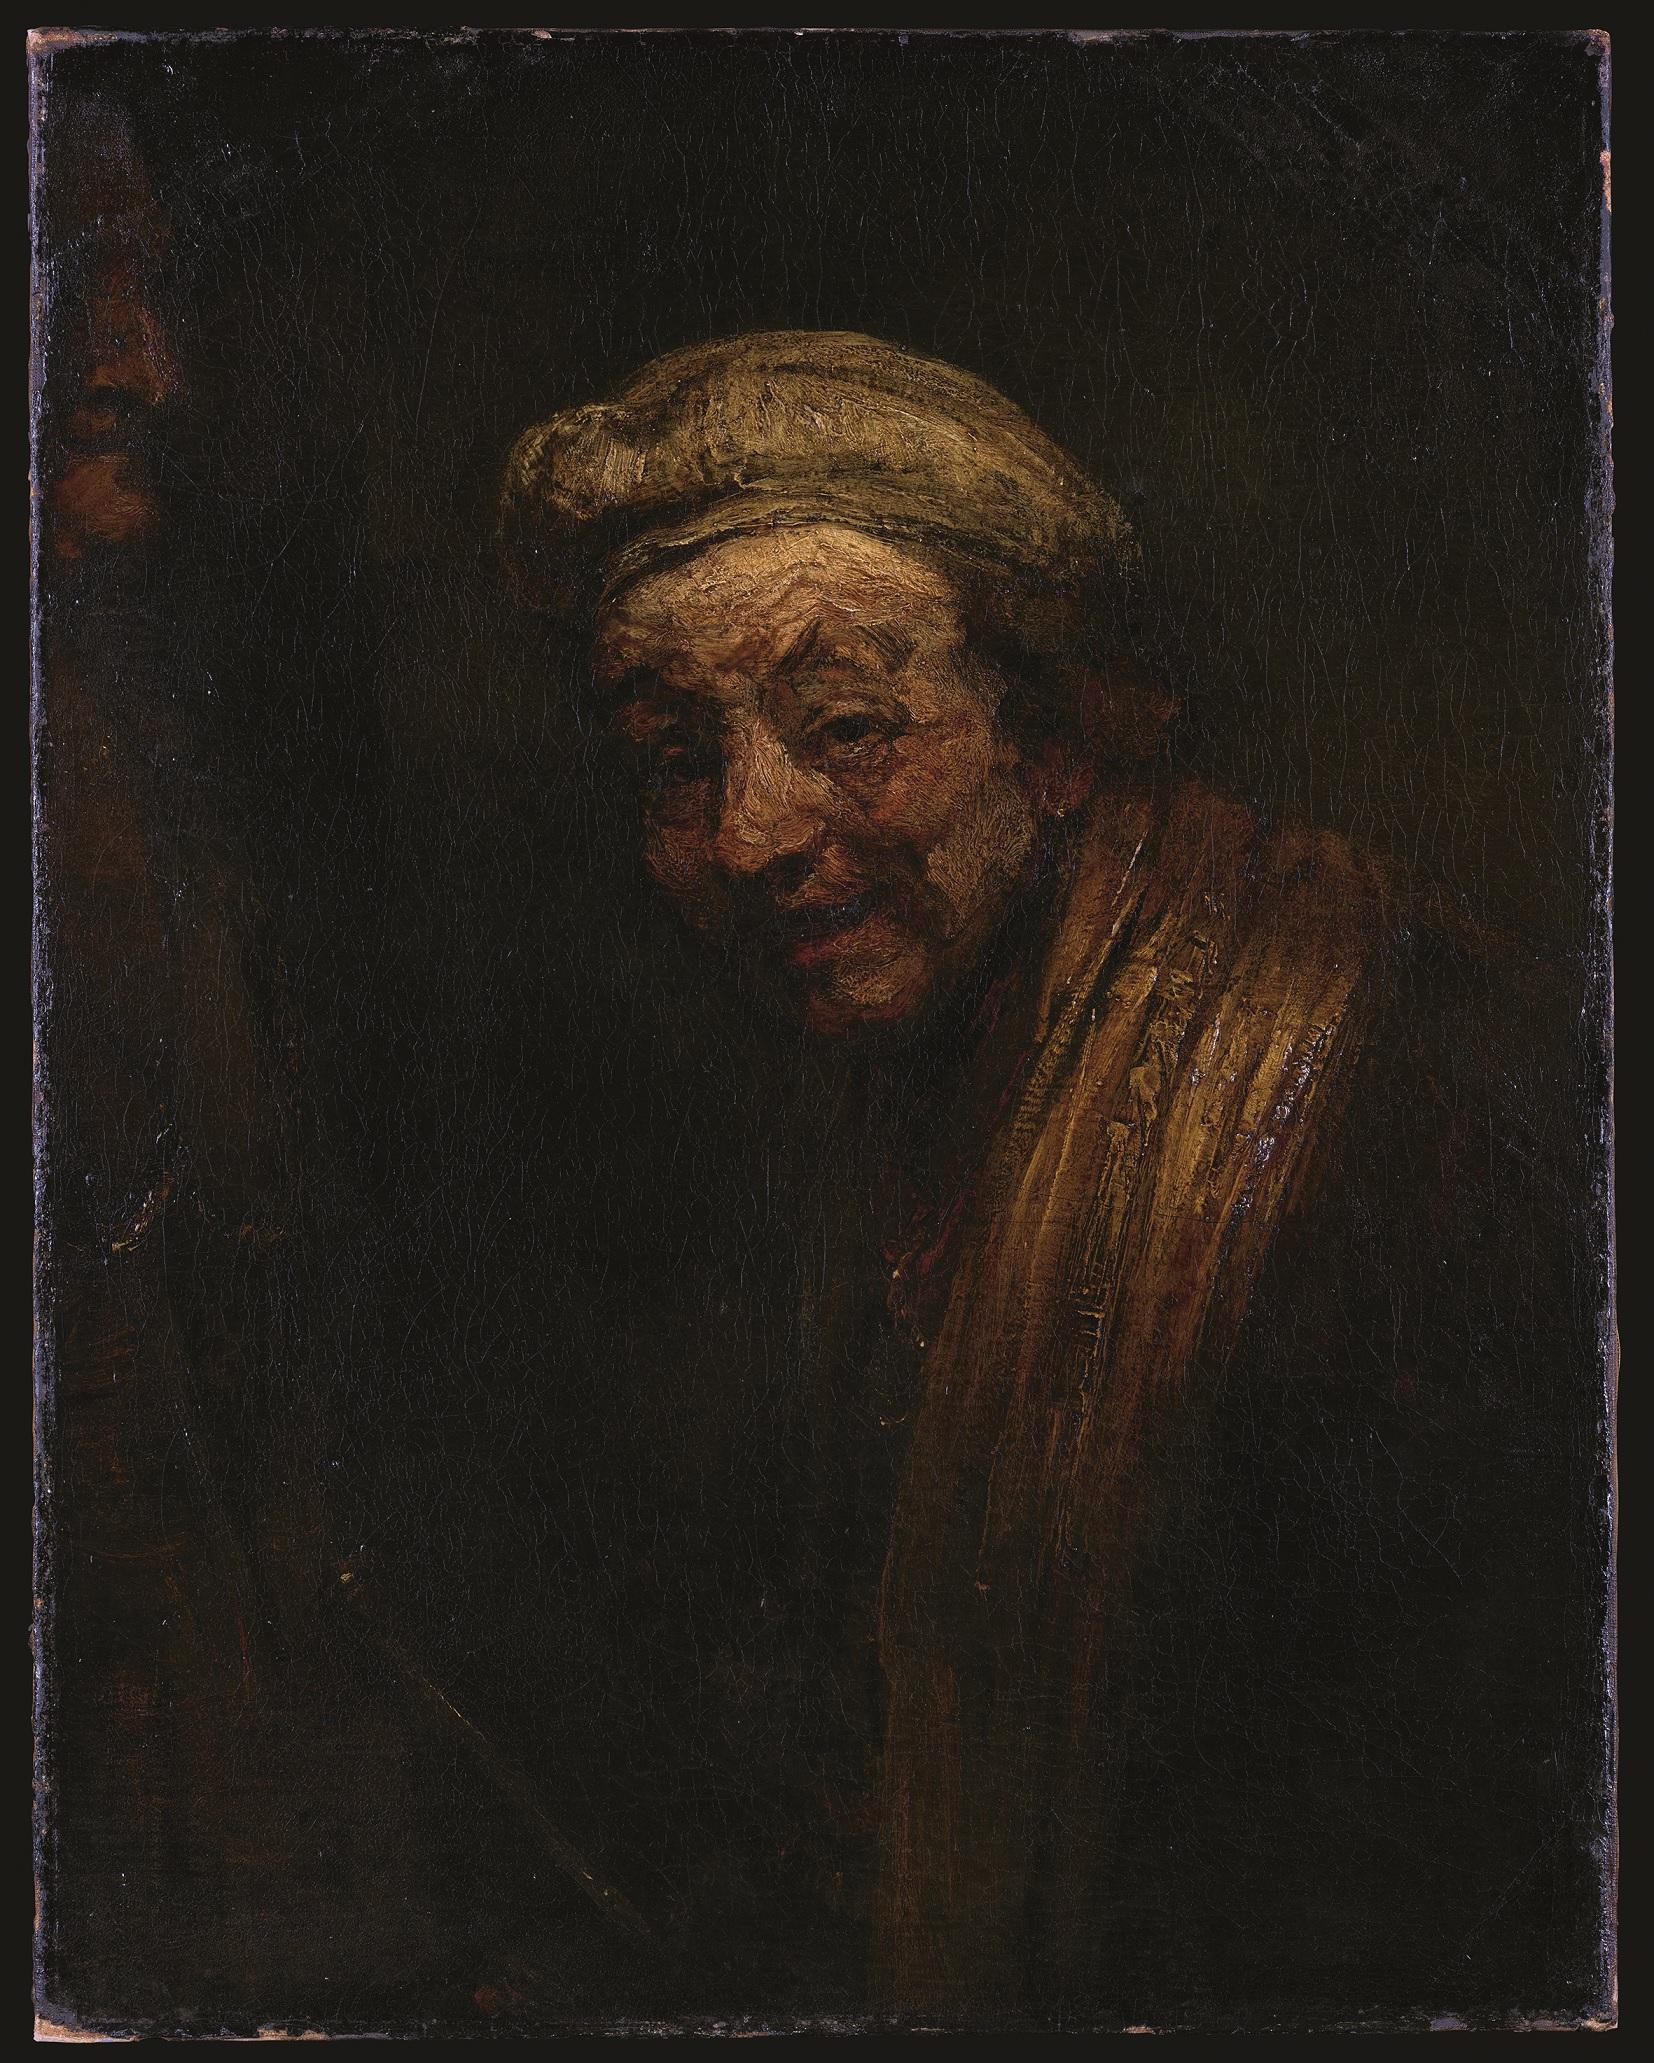 Rembrandt van Rijn (1606-1669), <em>Self-Portrait</em>, c. 1662/1663, oil on canvas, 82.5 x 65 cm, Wallraf-Richartz-Museum & Fondation Corboud, Cologne © Rheinisches Bildarchiv Köln, Britta Schlier